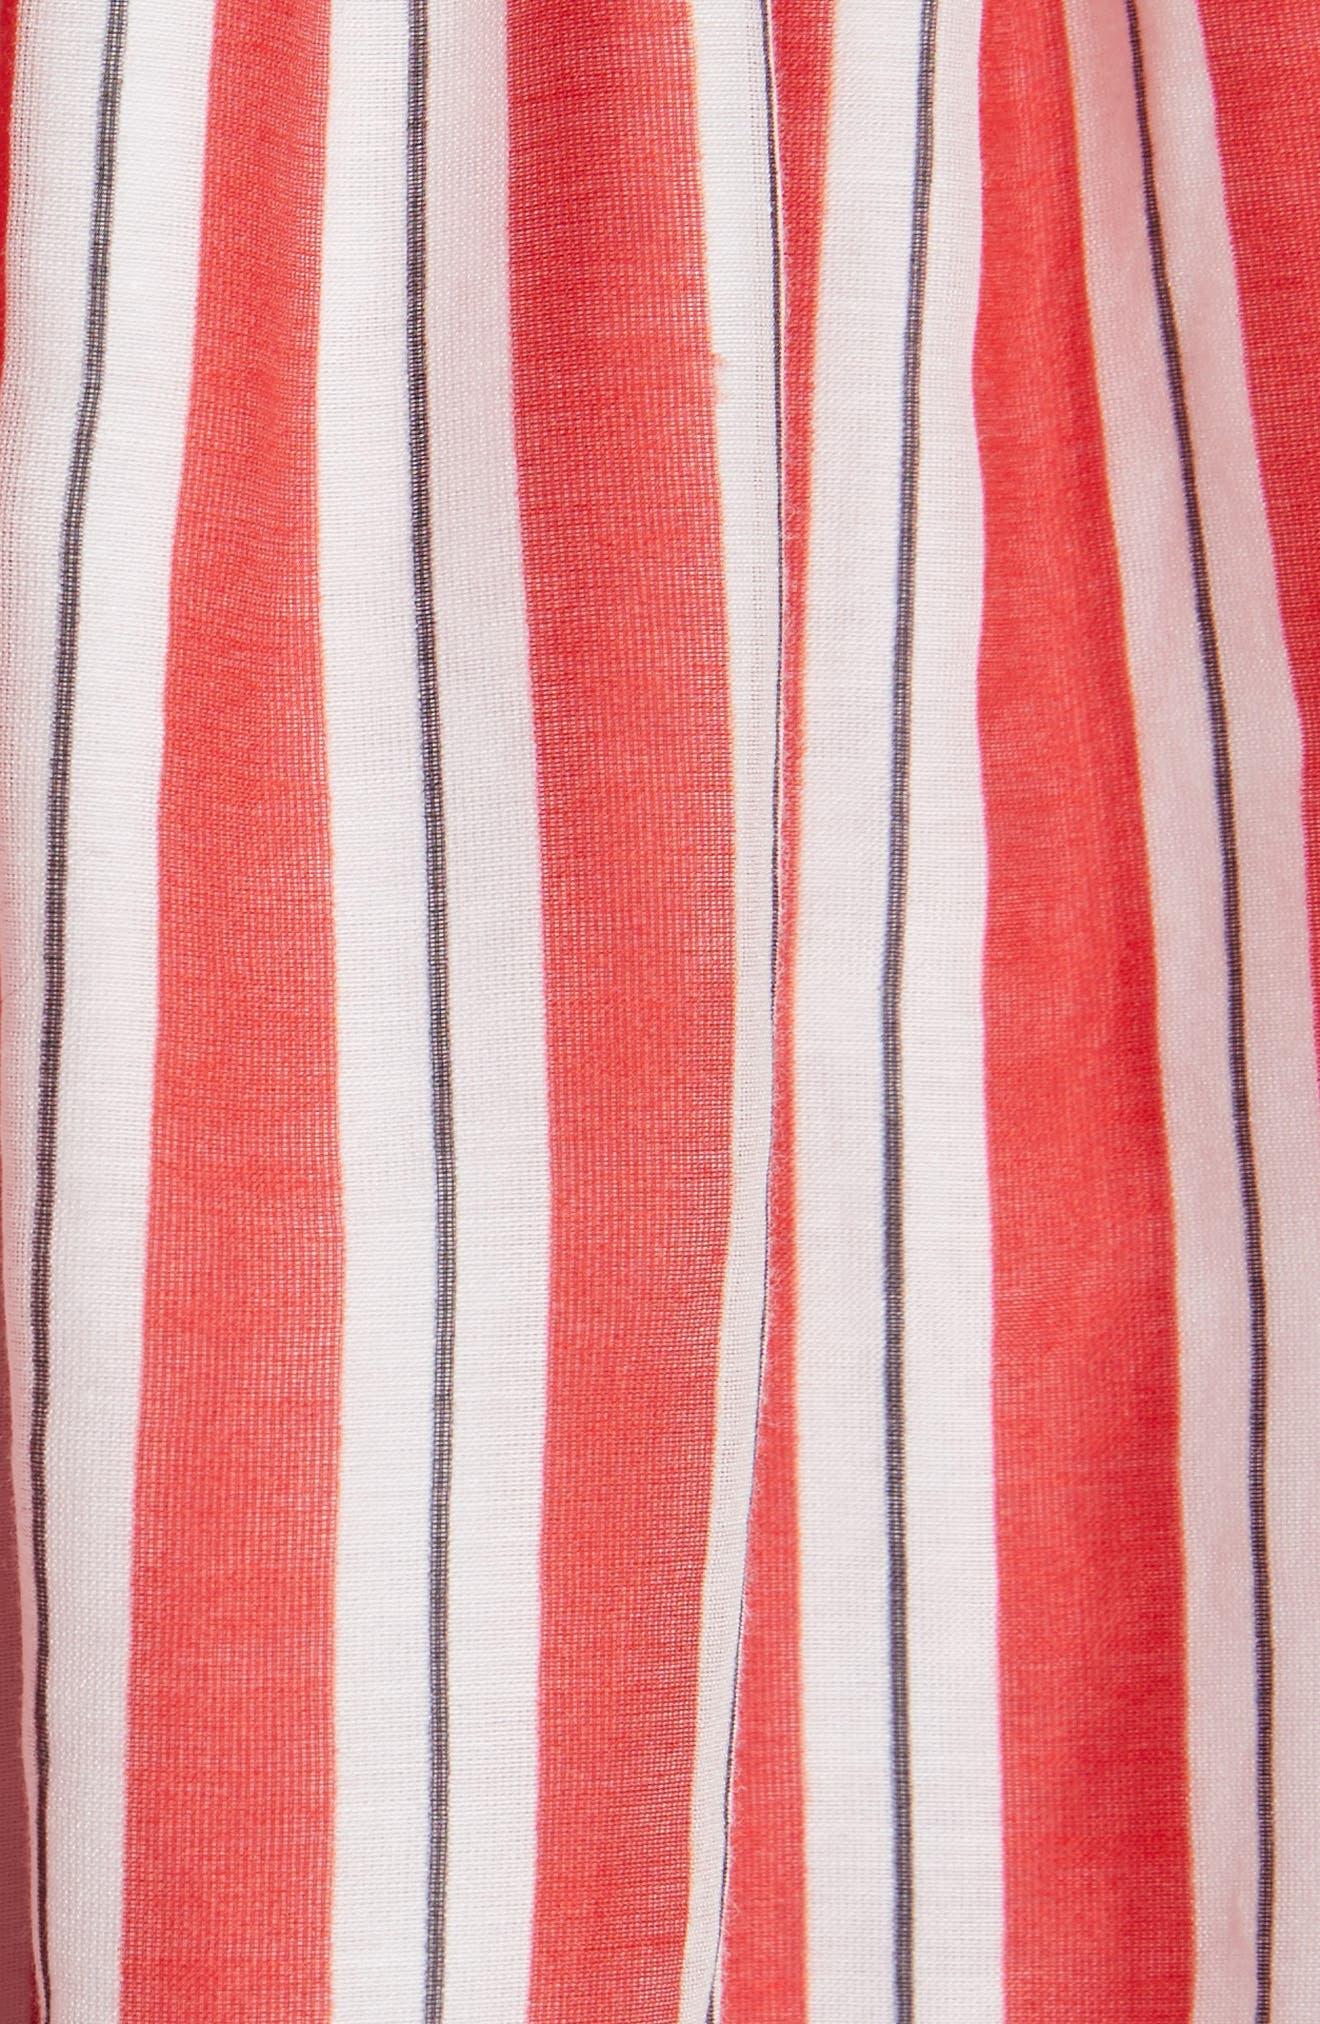 Alessandra Off the Shoulder Silk Top,                             Alternate thumbnail 5, color,